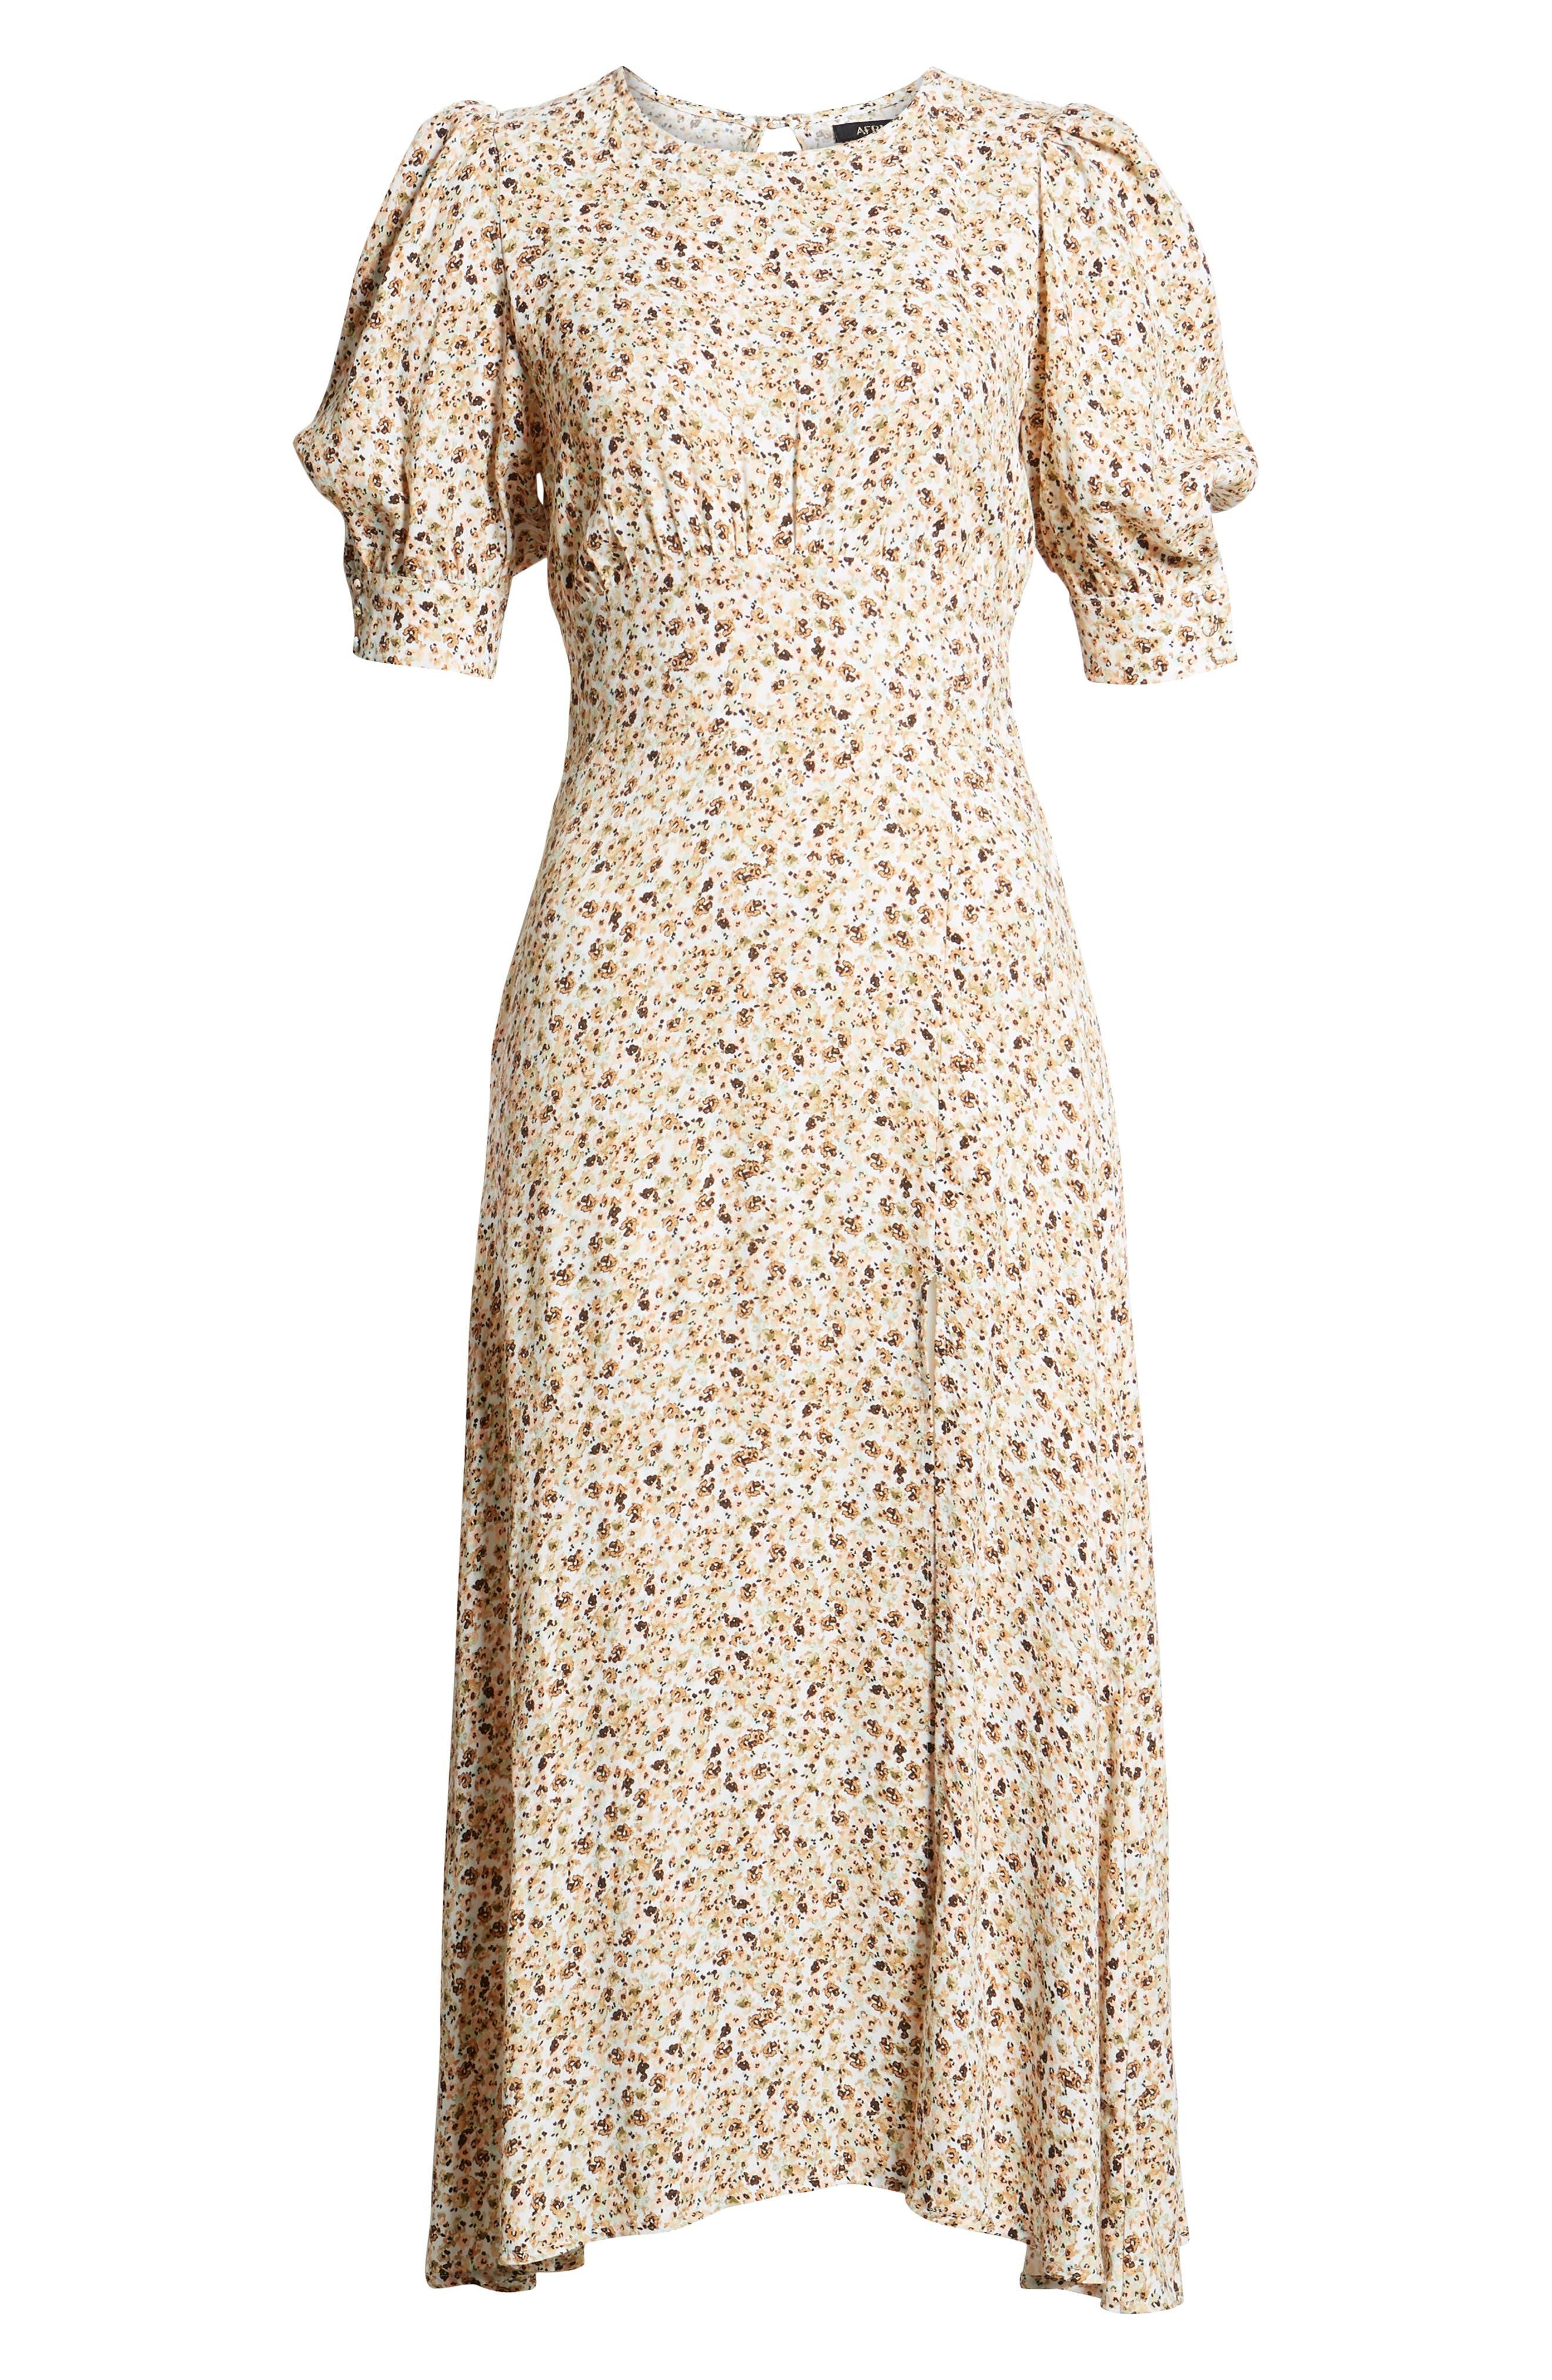 Lala Midi Dress,                             Alternate thumbnail 7, color,                             Beige Ditsy